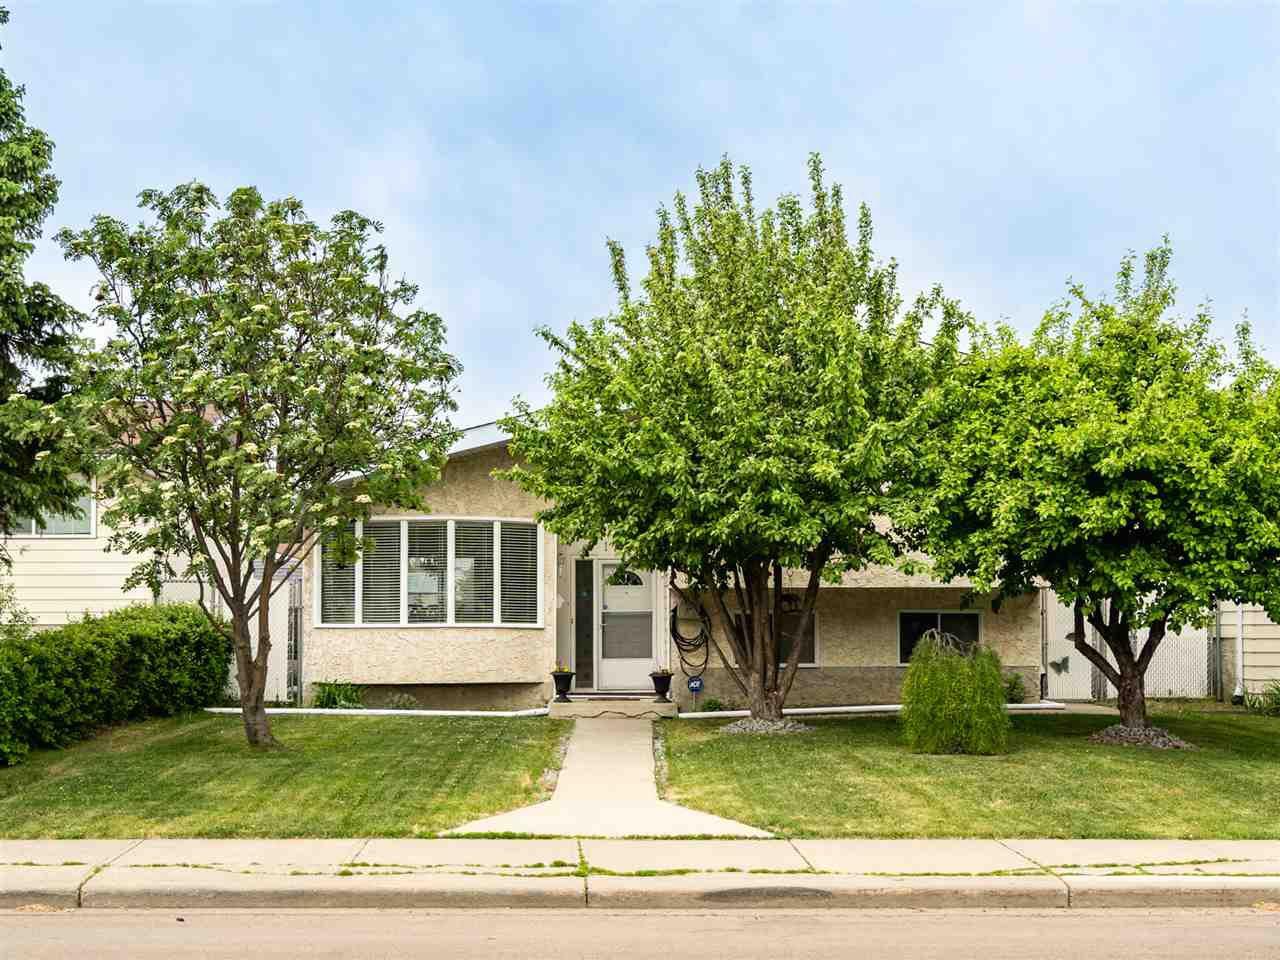 Main Photo: 1736 62 Street in Edmonton: Zone 29 House for sale : MLS®# E4160700